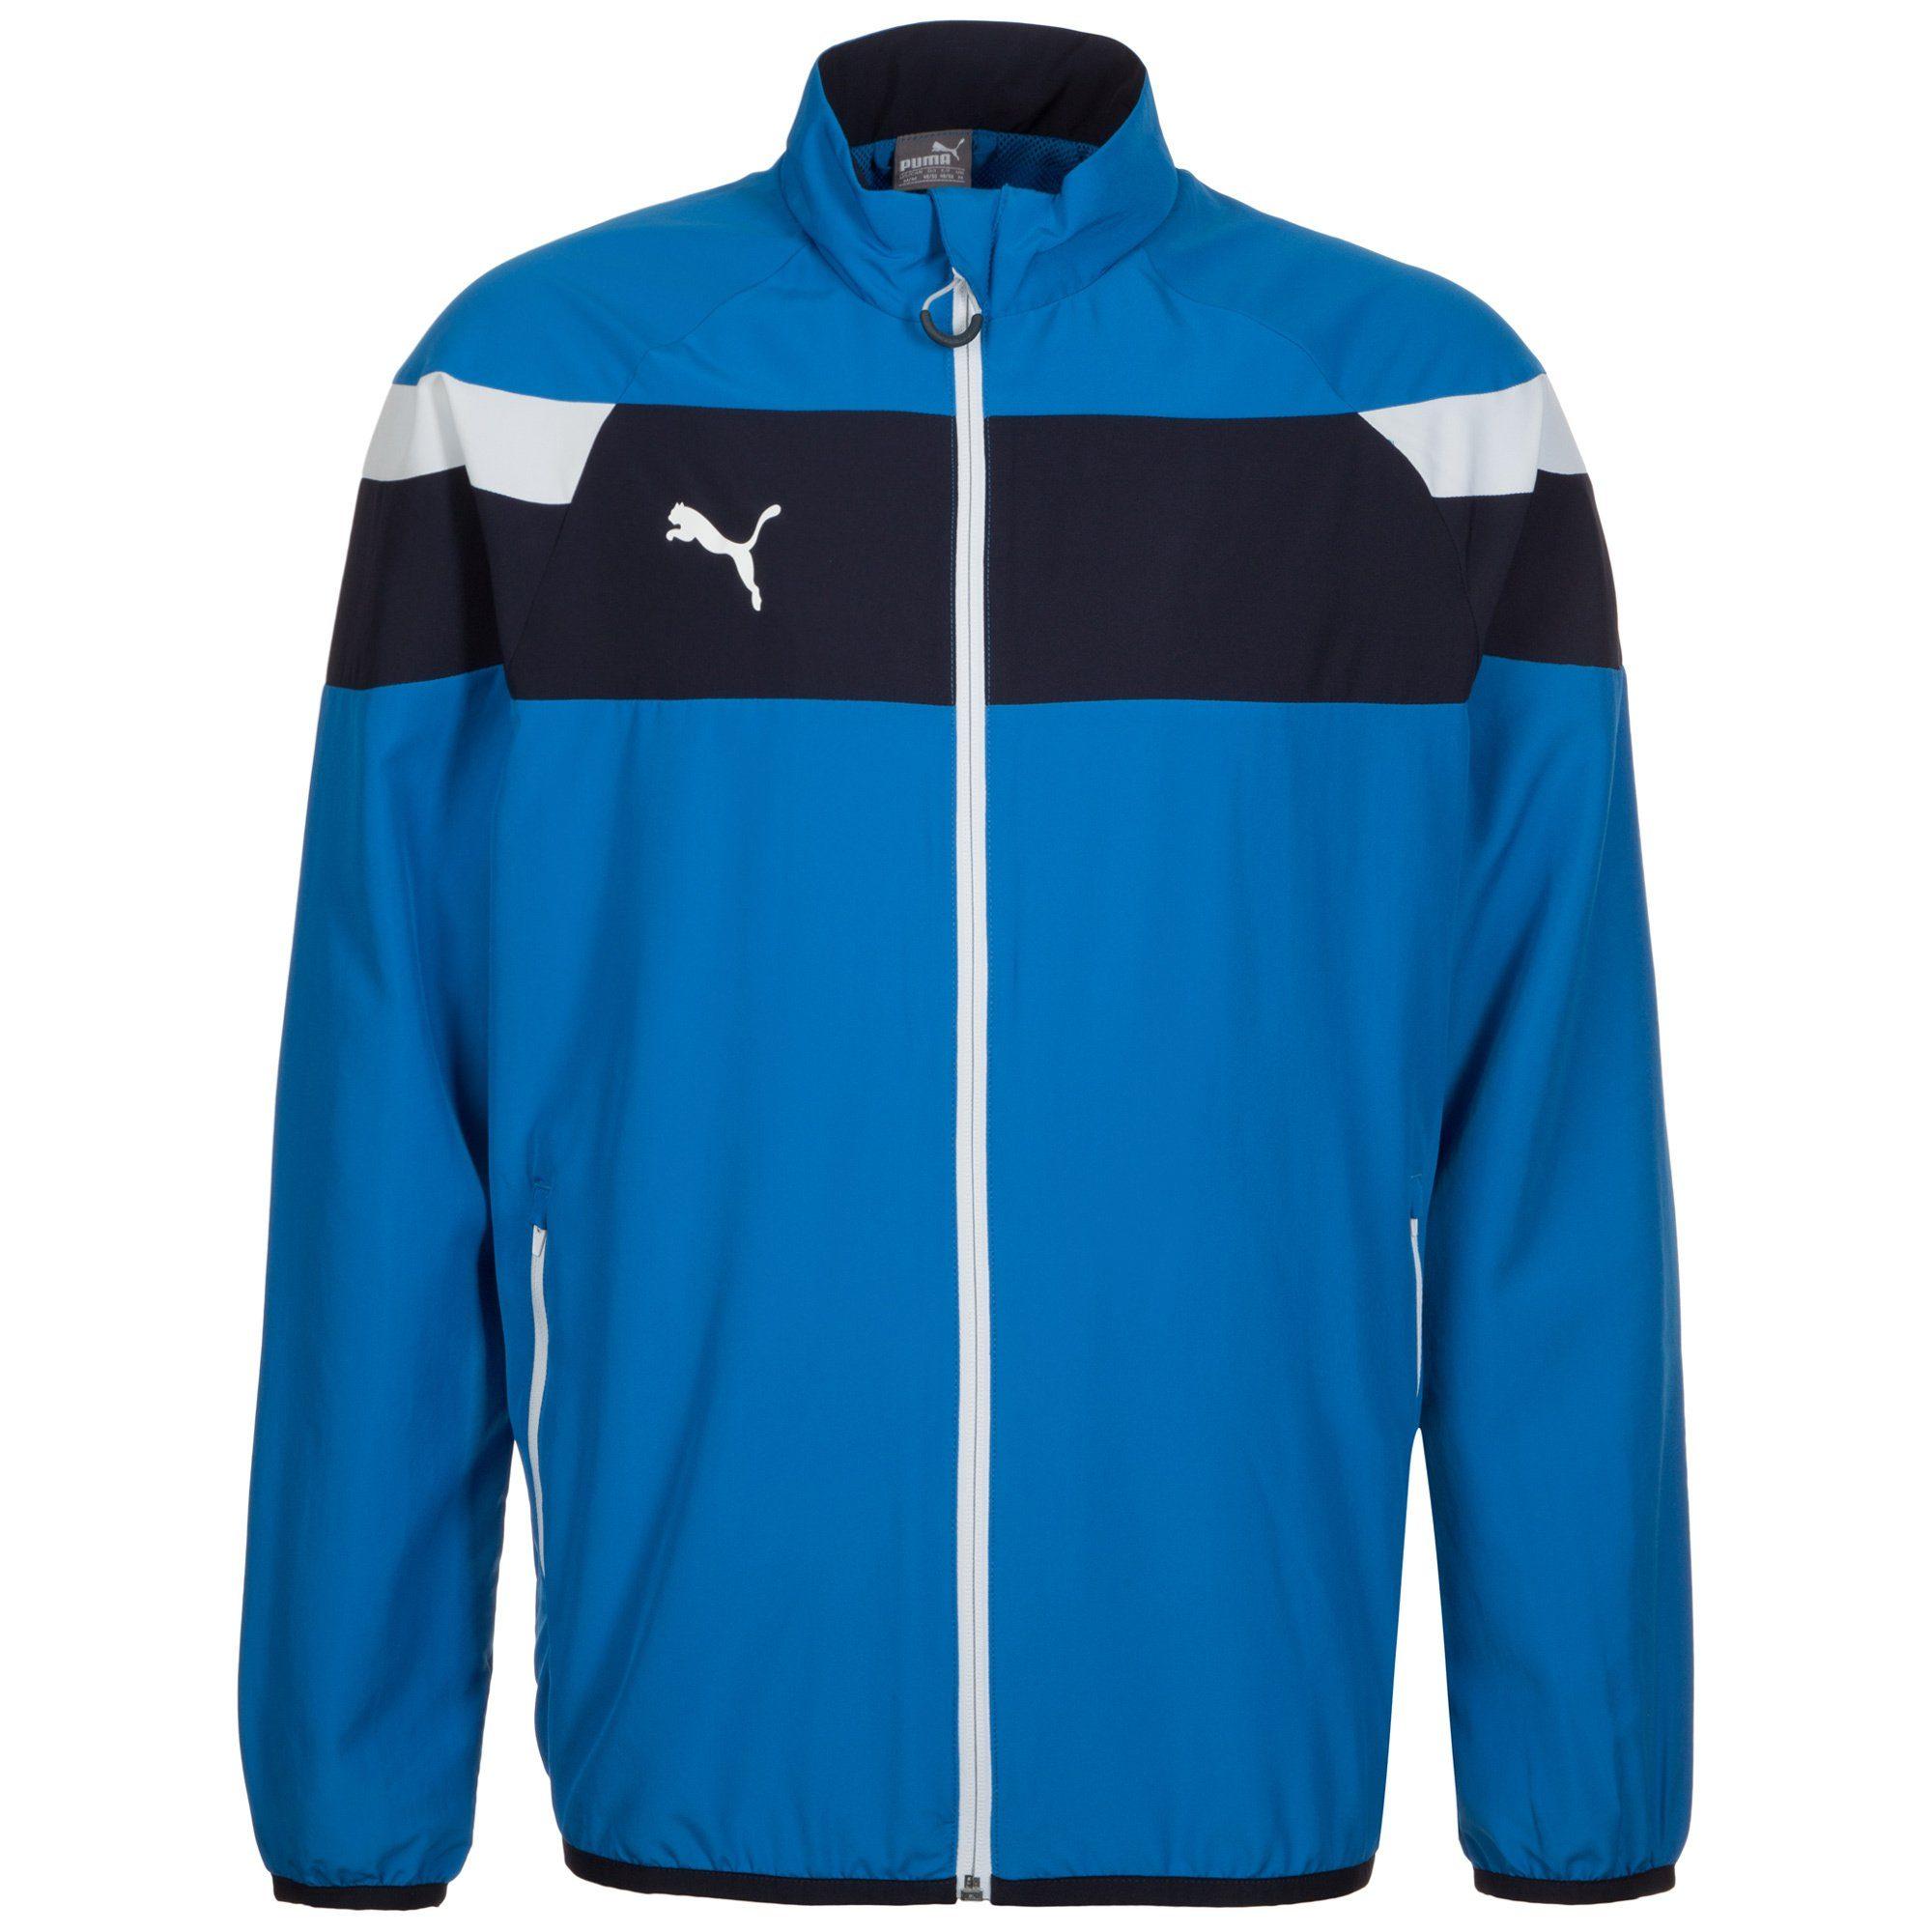 PUMA Trainingsjacke »Spirit Ii Woven«   Sportbekleidung > Sportjacken > Trainingsjacken   Blau   Puma